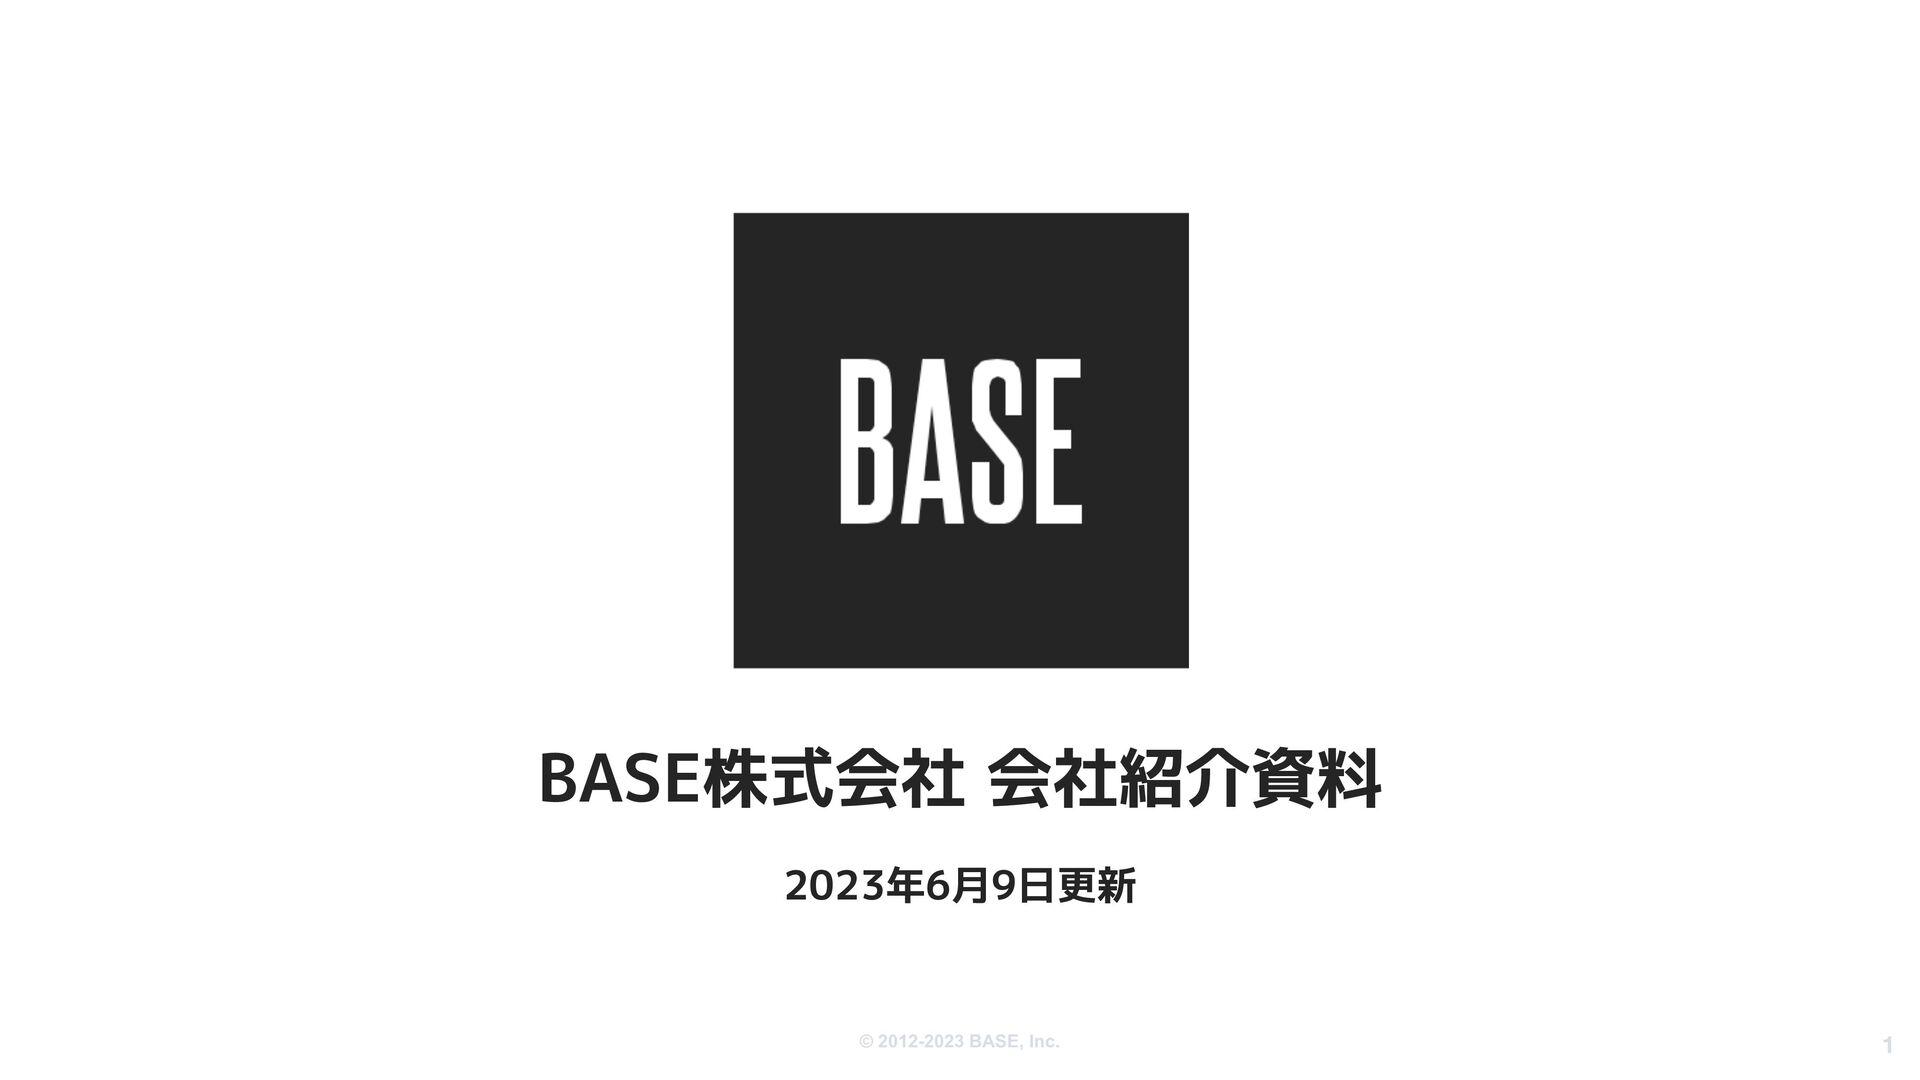 © 2012-2020 BASE, Inc. 1 BASE株式会社 会社紹介資料 2020年6...